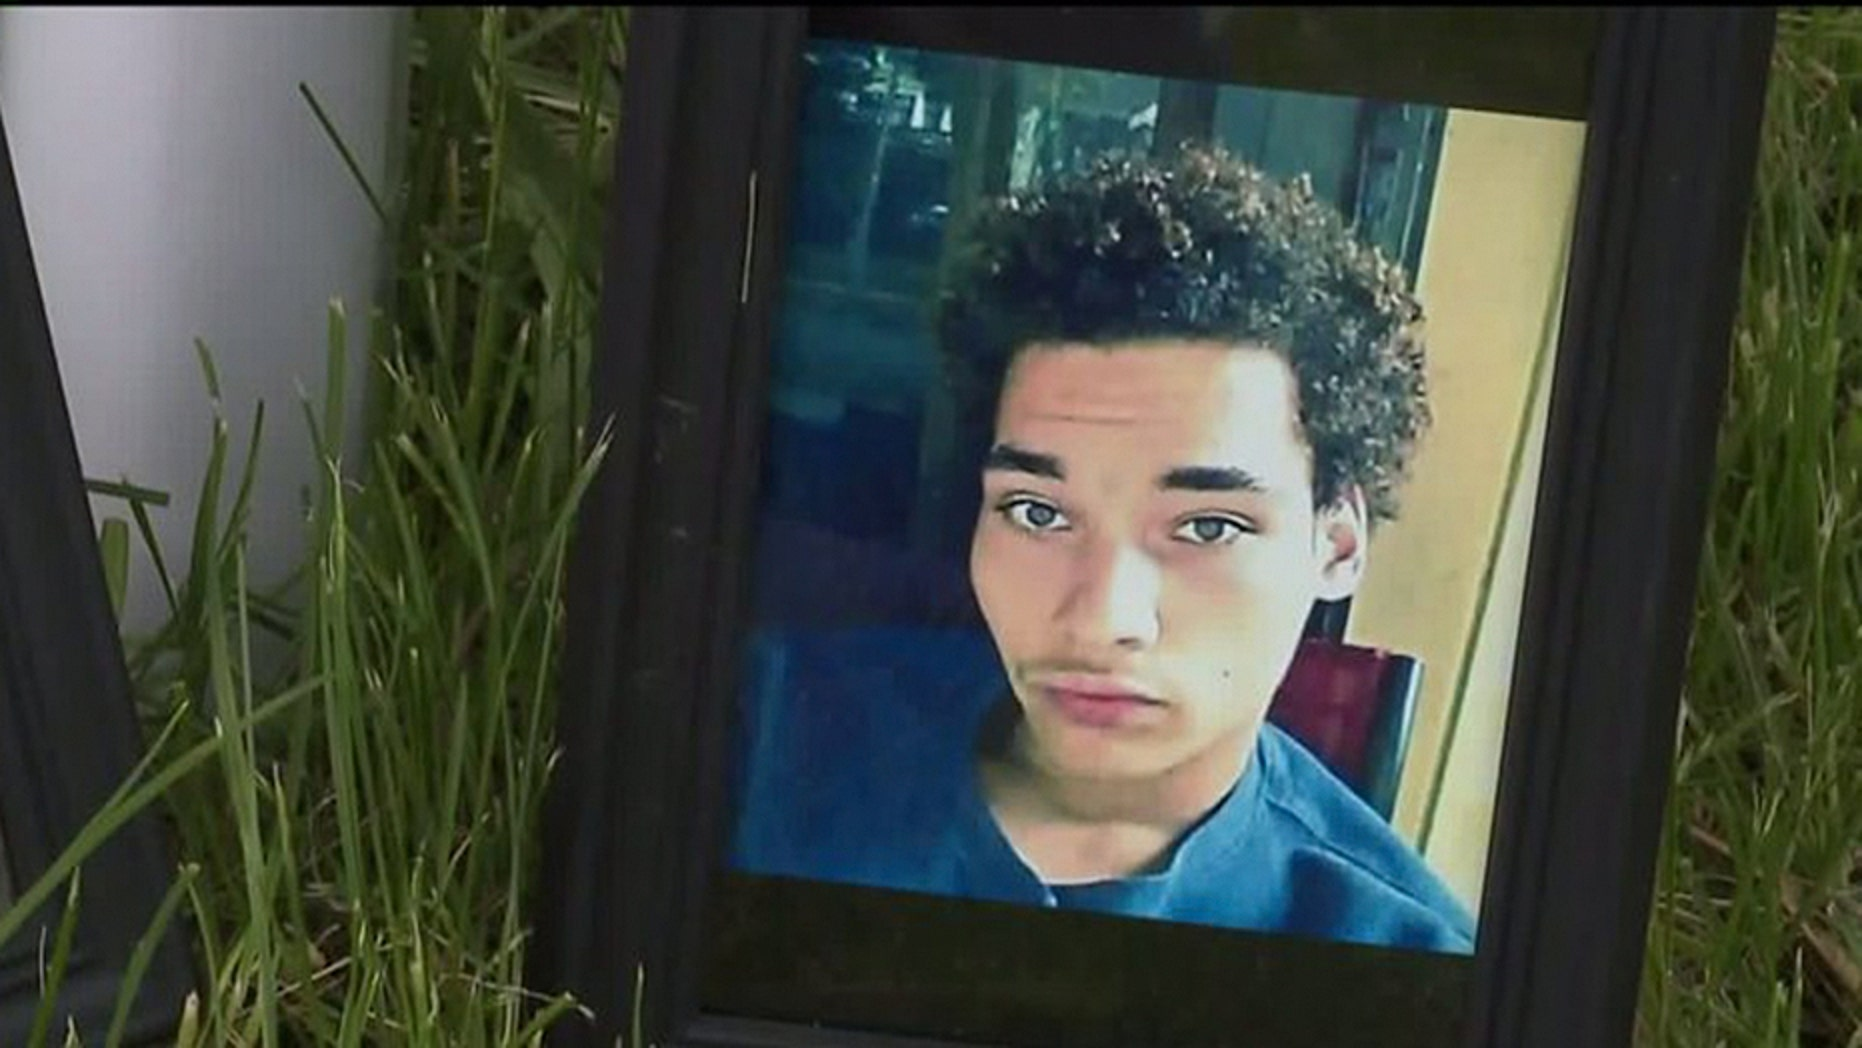 Police officers used a stun gun on Adam Trammell last year.